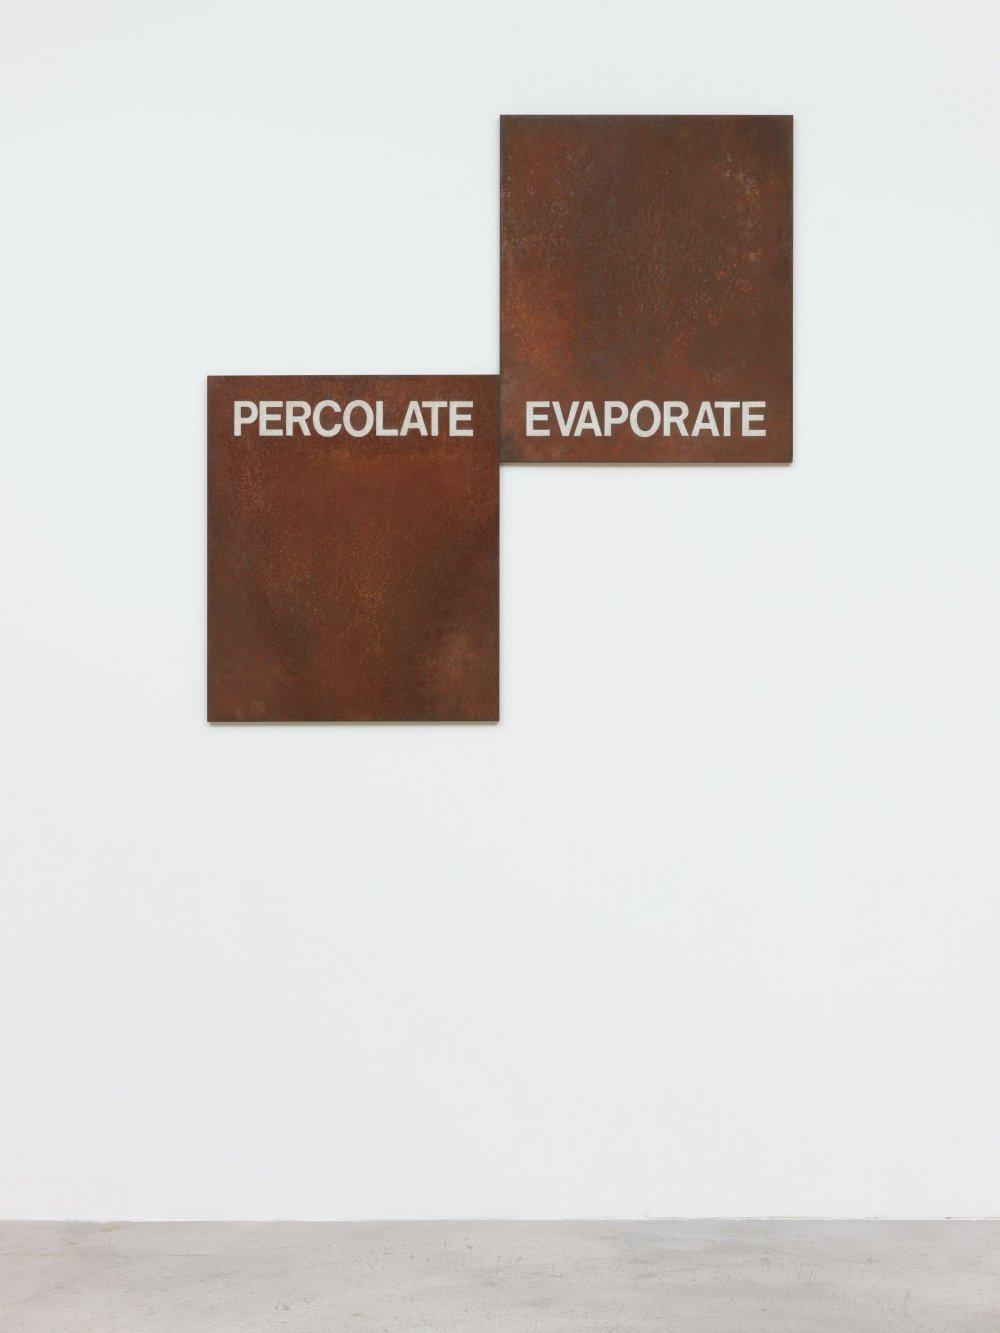 Percolate/Evaporate